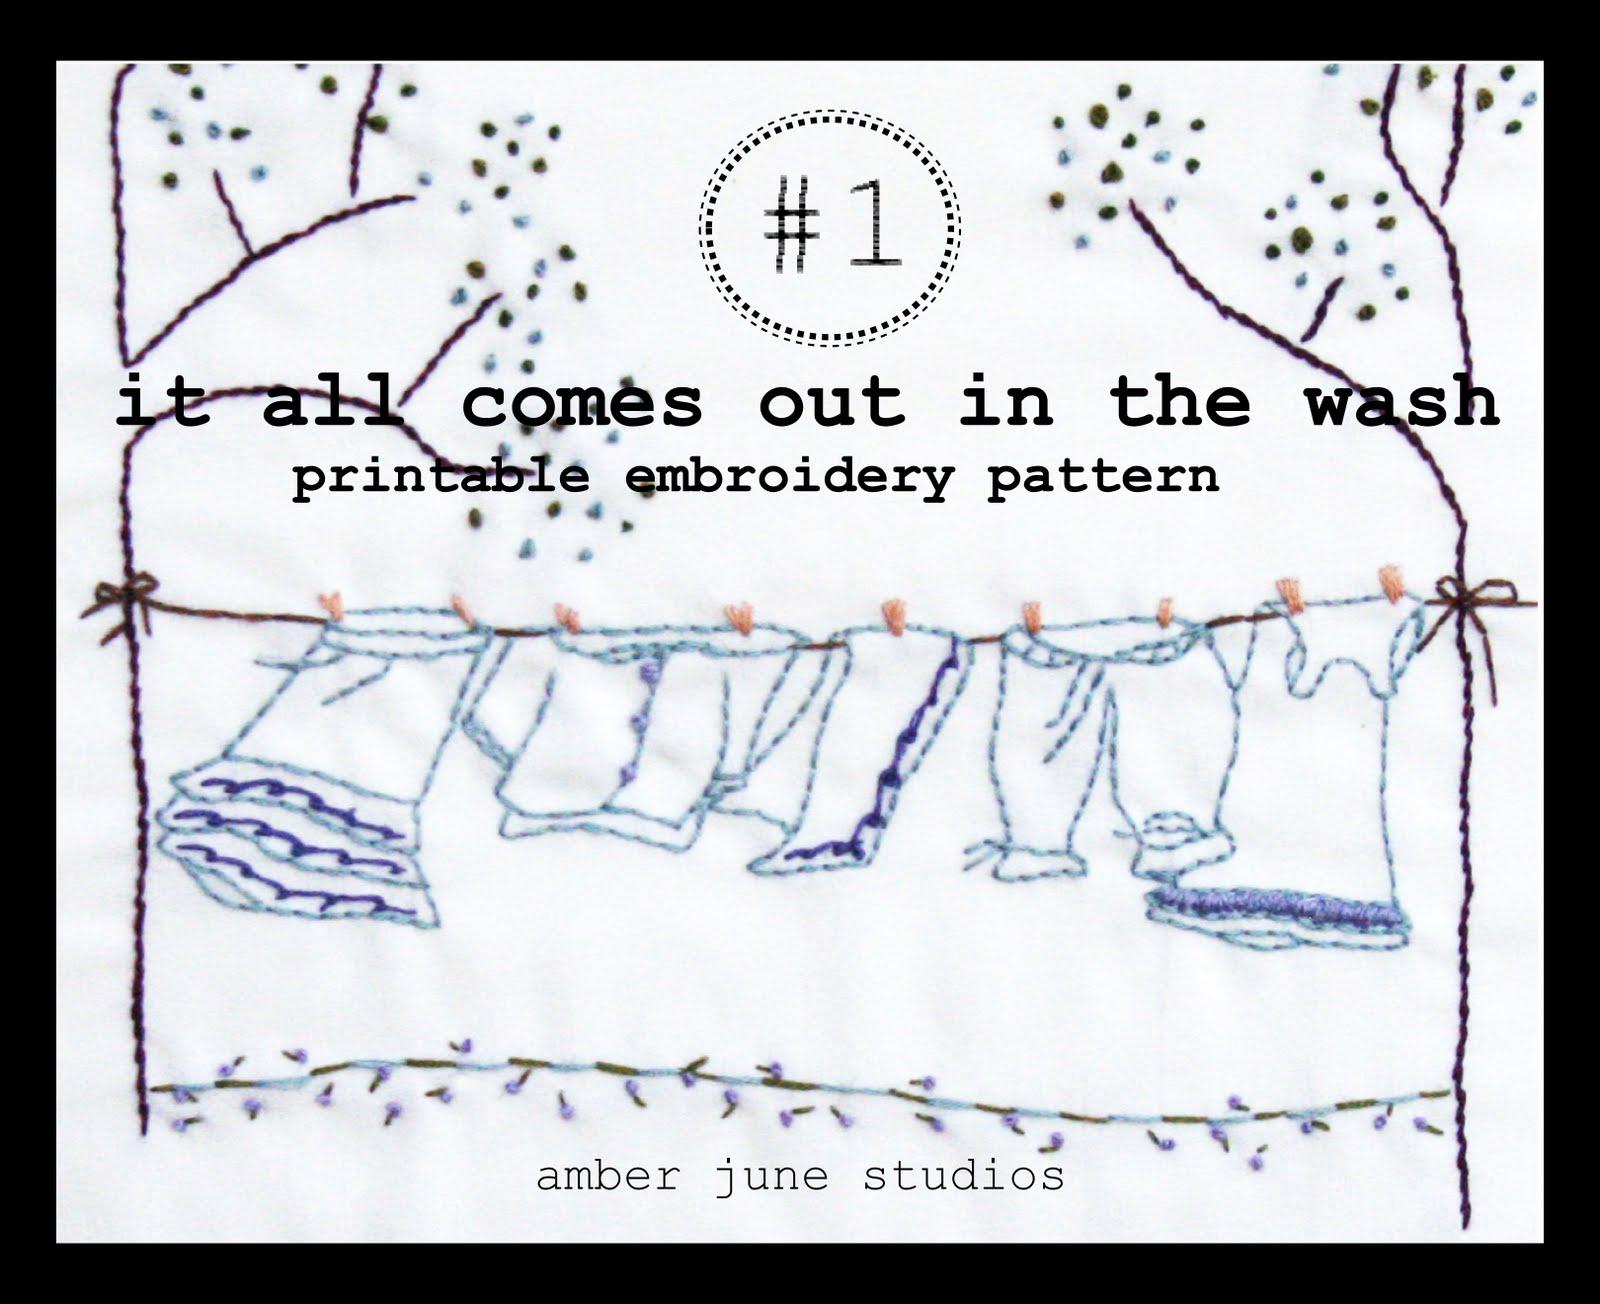 Amber June Studios Embroidery